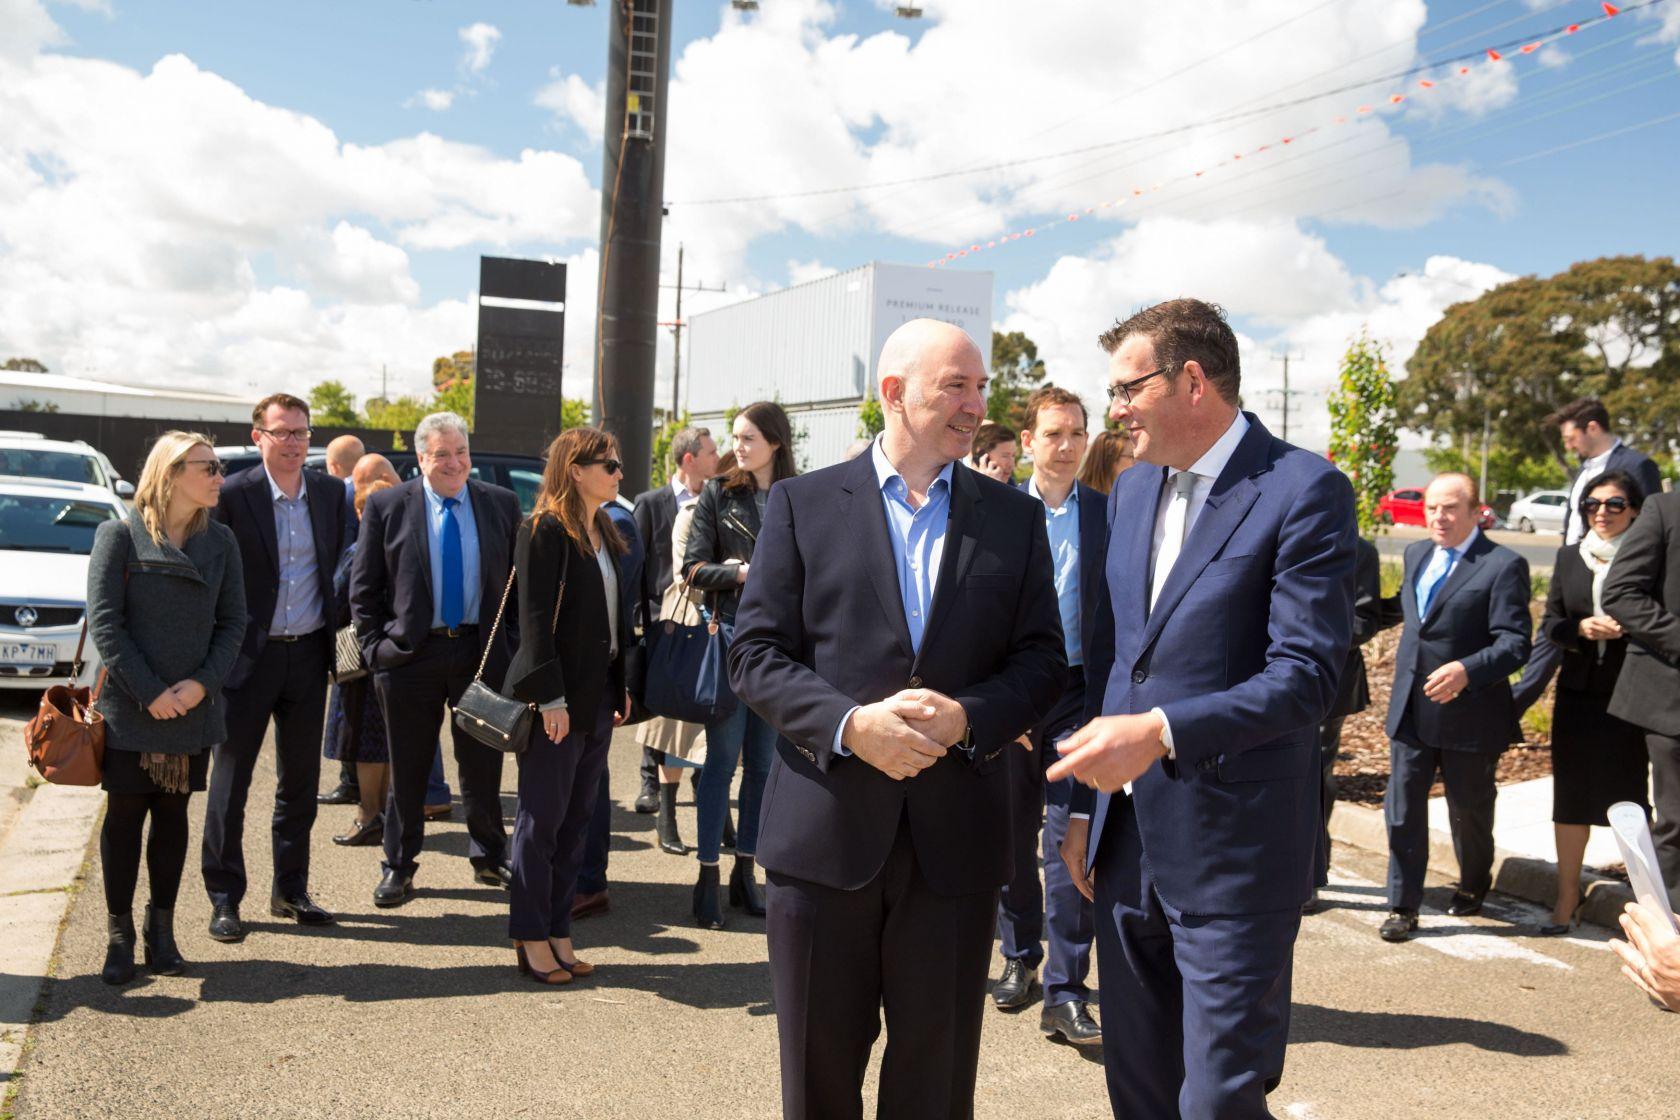 peter schiavello standing with premier daniel andrews m-city monash development turning of soil ceremony